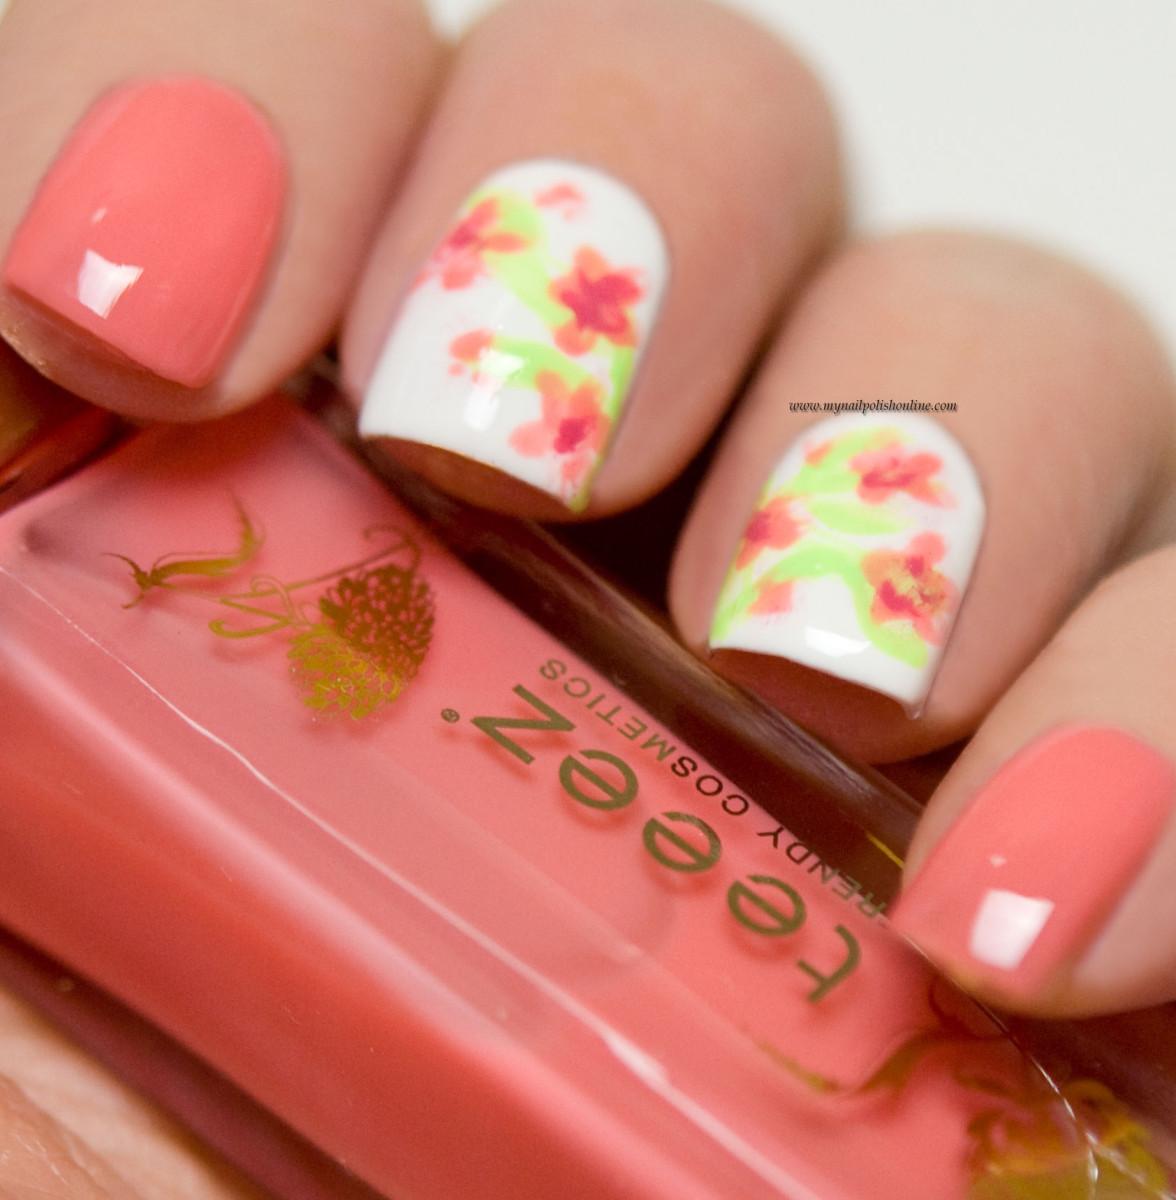 Flower Nail Art: My Nail Polish Online